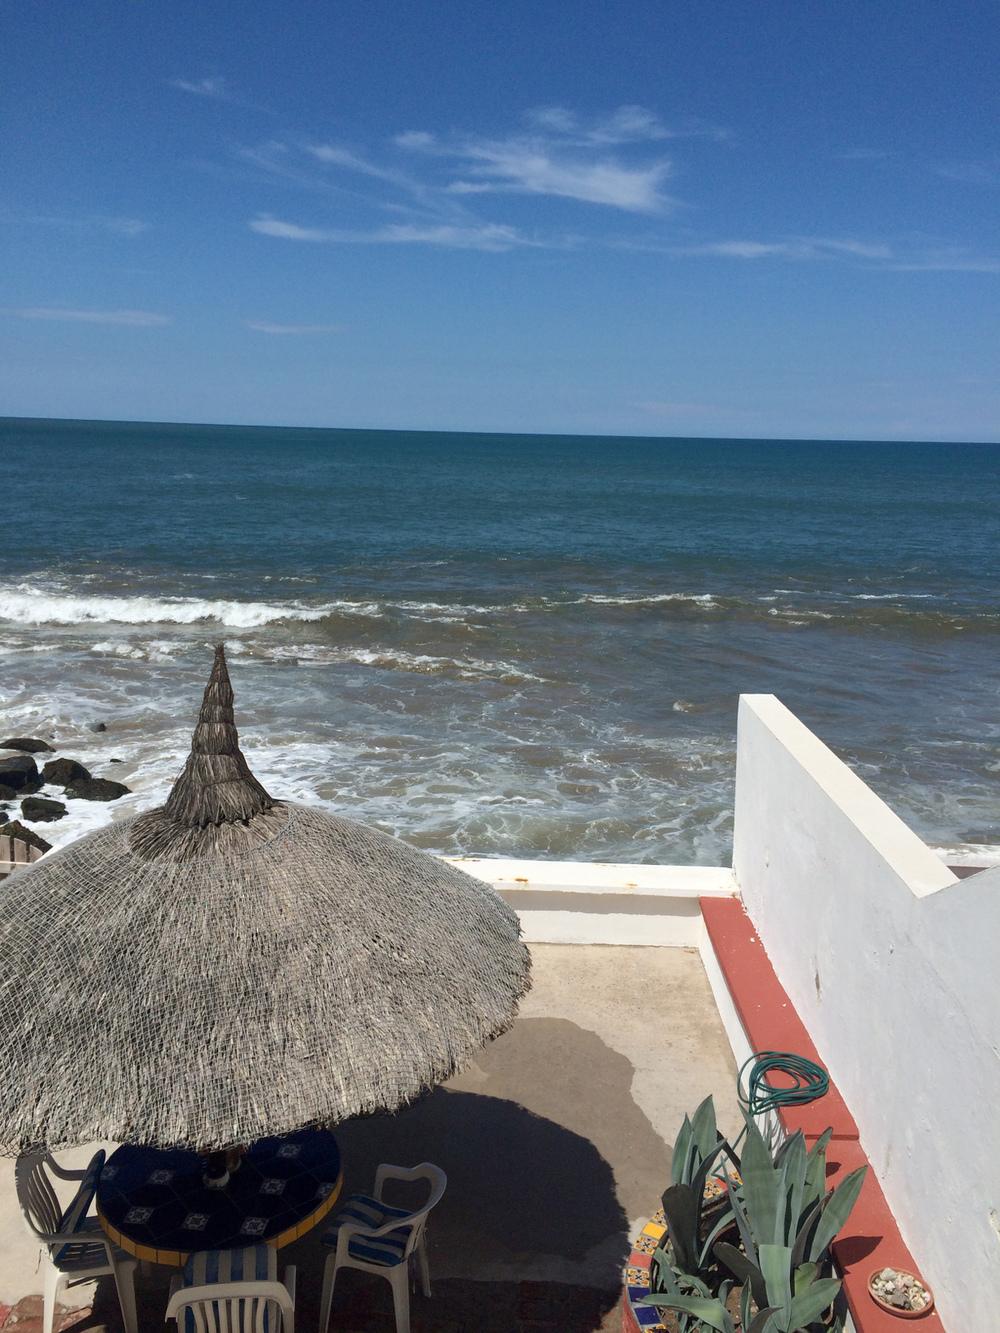 ventanas.mexico.living-in-mexico-photo